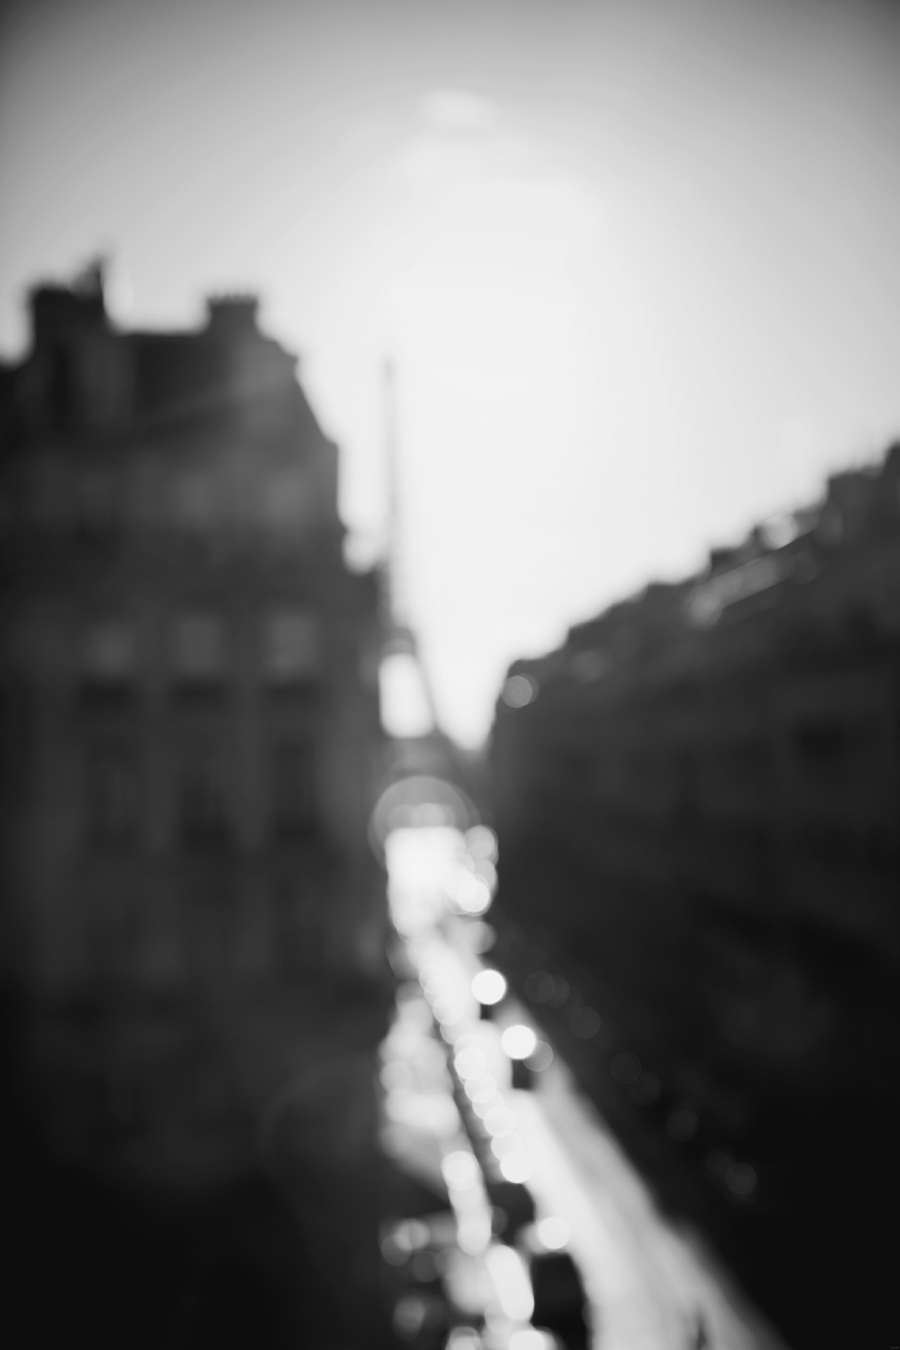 radisson_blu_le_metropolitan_paris_eiffel_18